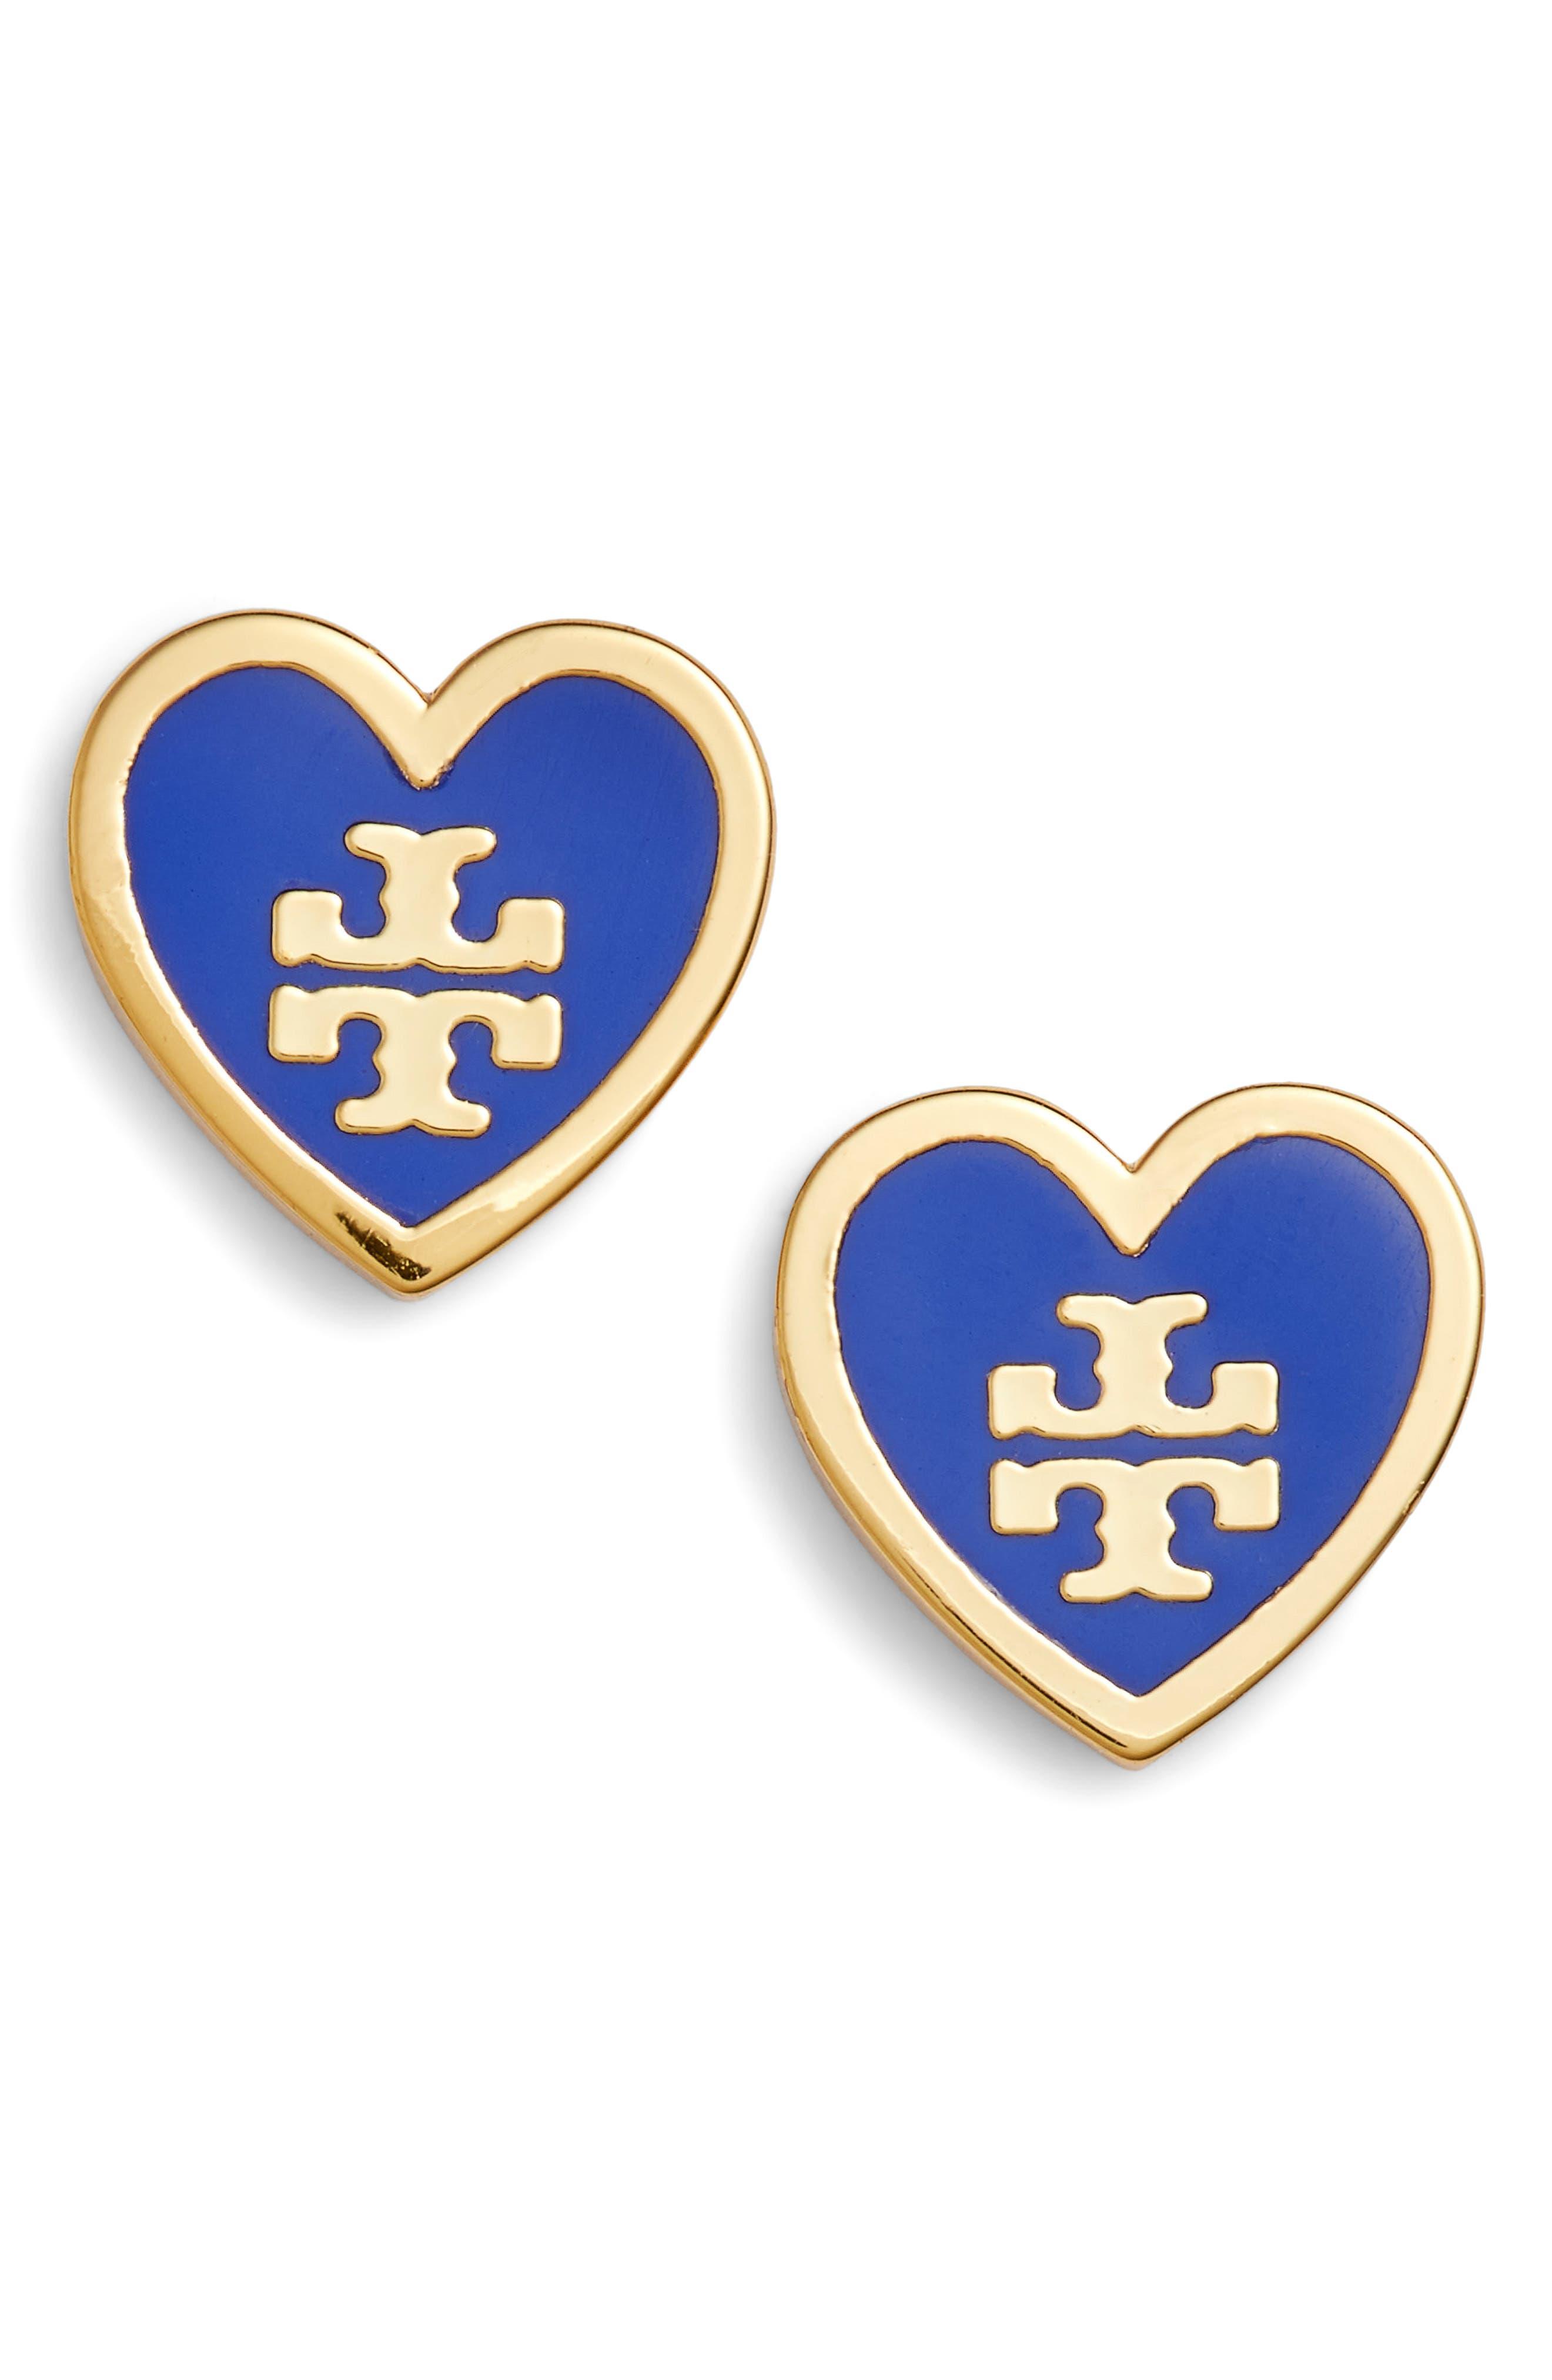 Logo Heart Stud Earrings,                         Main,                         color, Blue Dahlia / Tory Gold